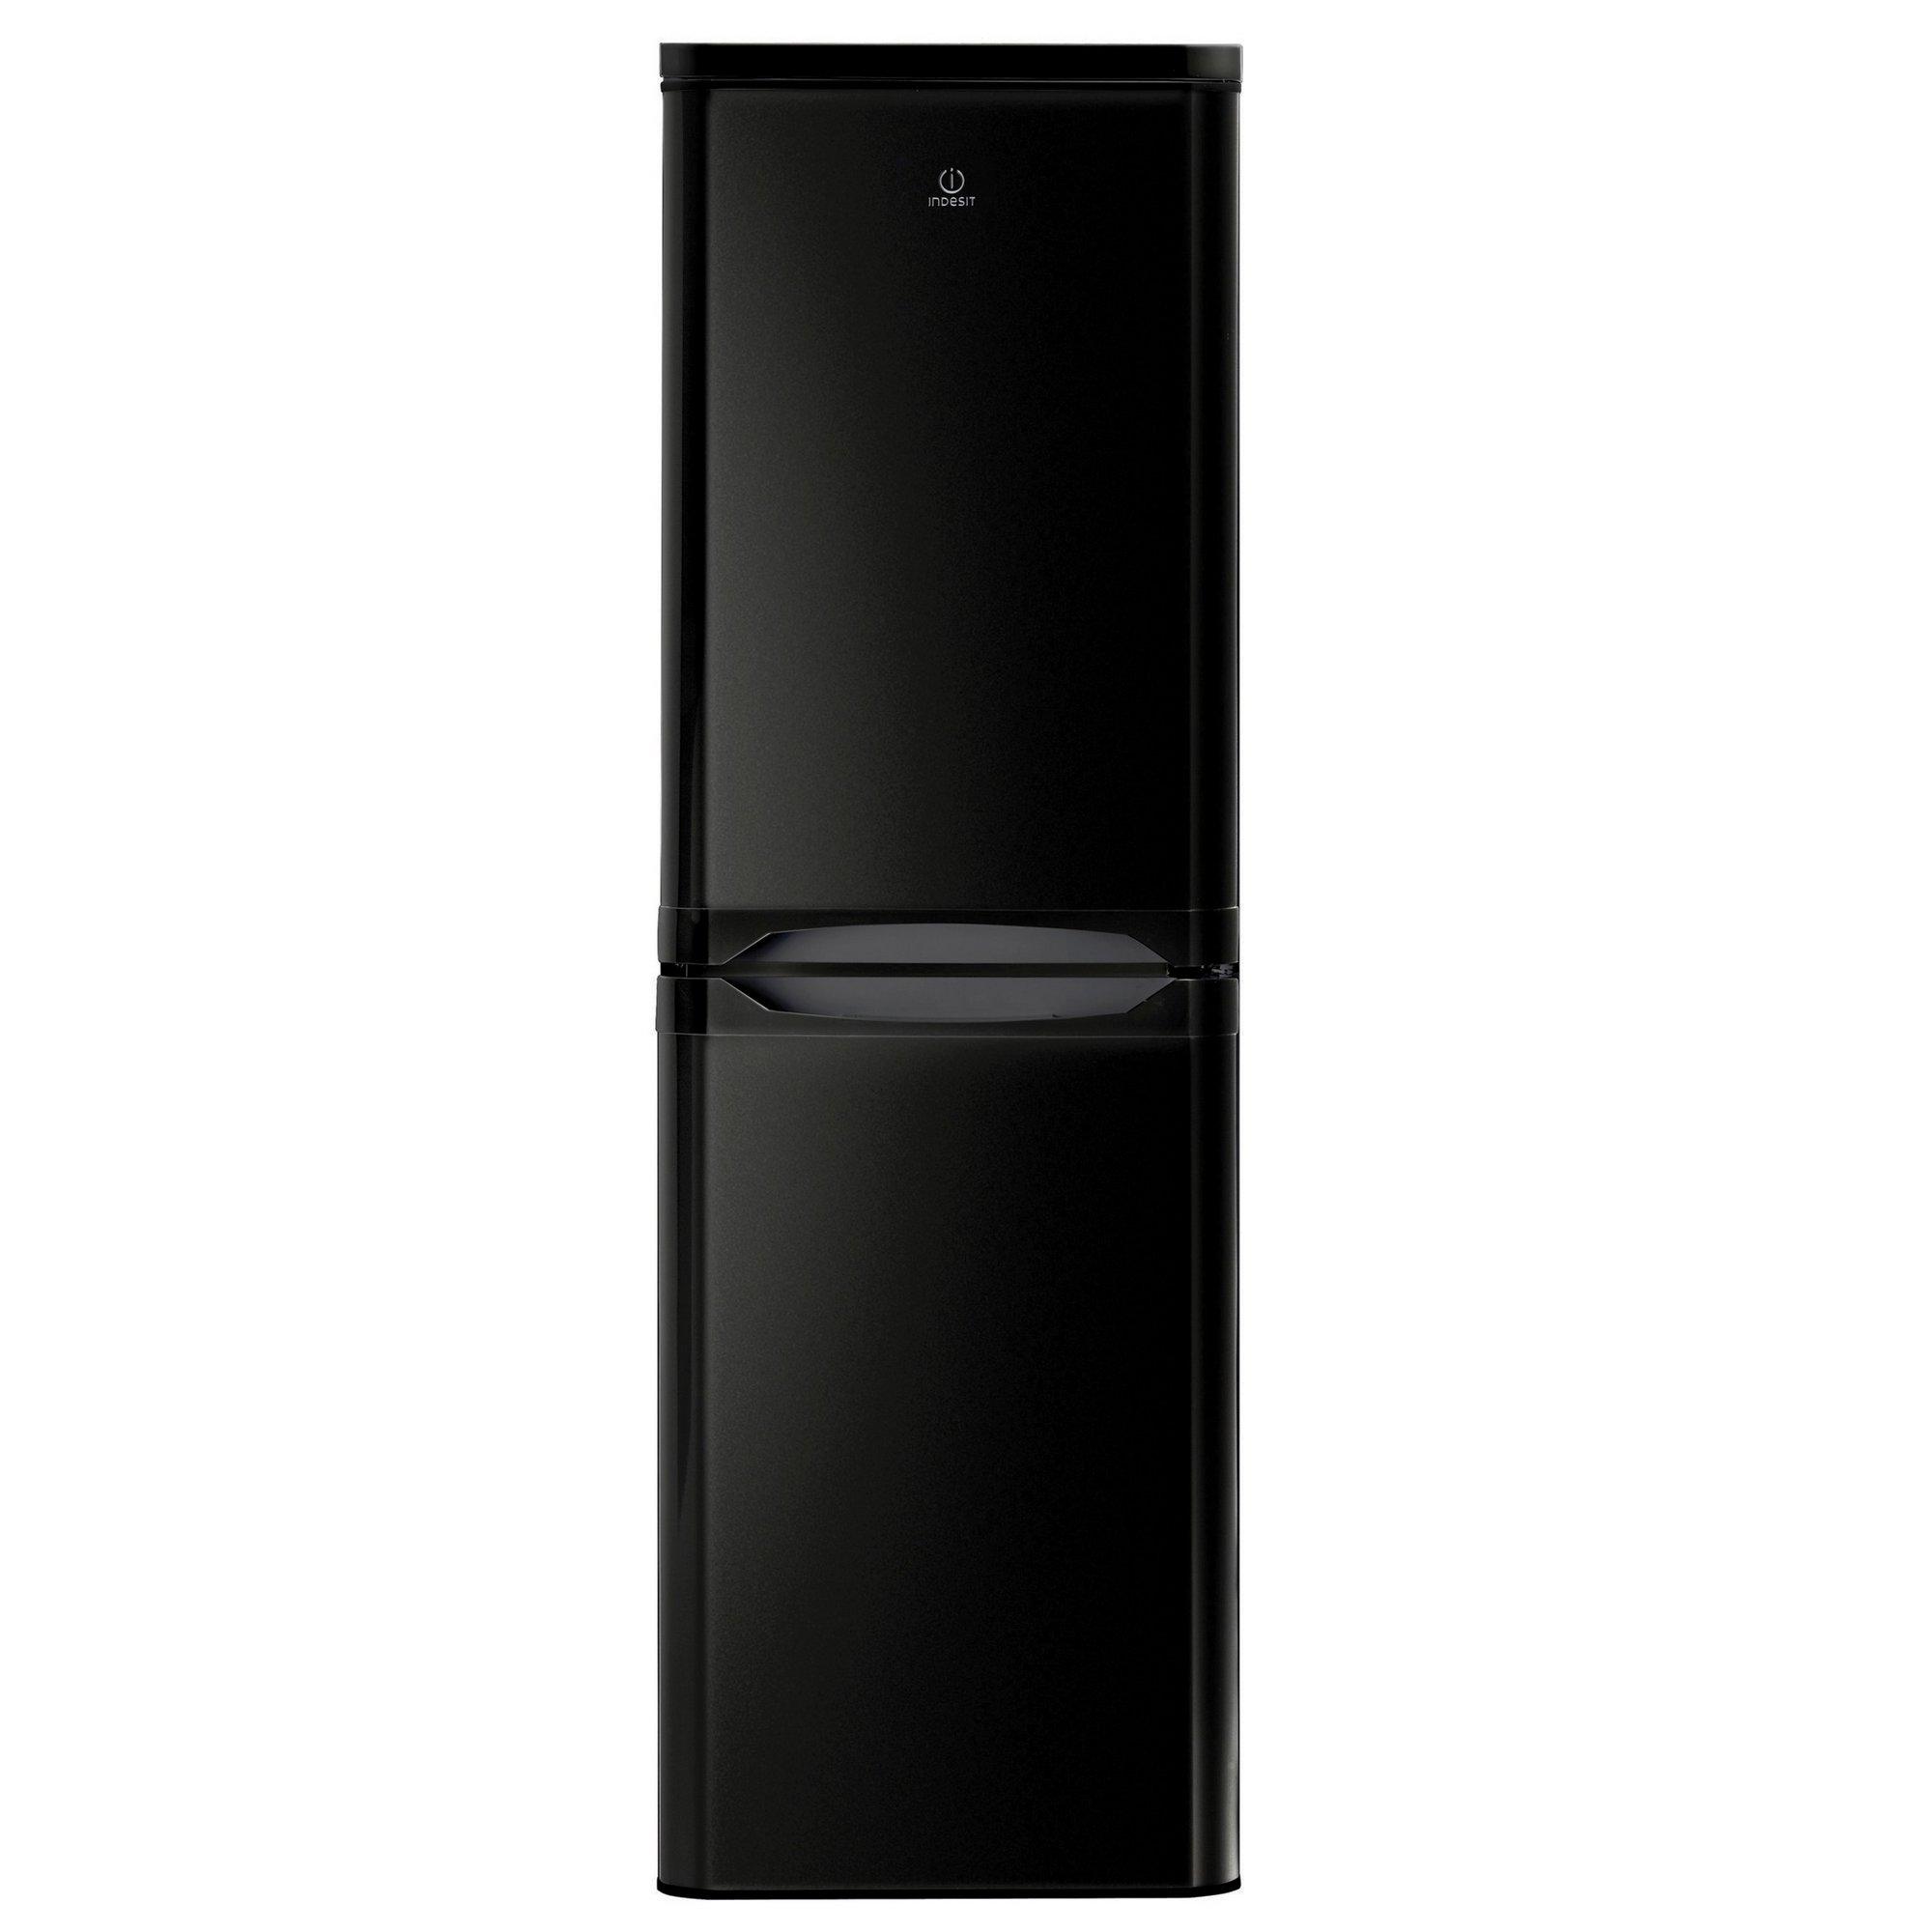 Image of Indesit 55cm A+ Fridge Freezer